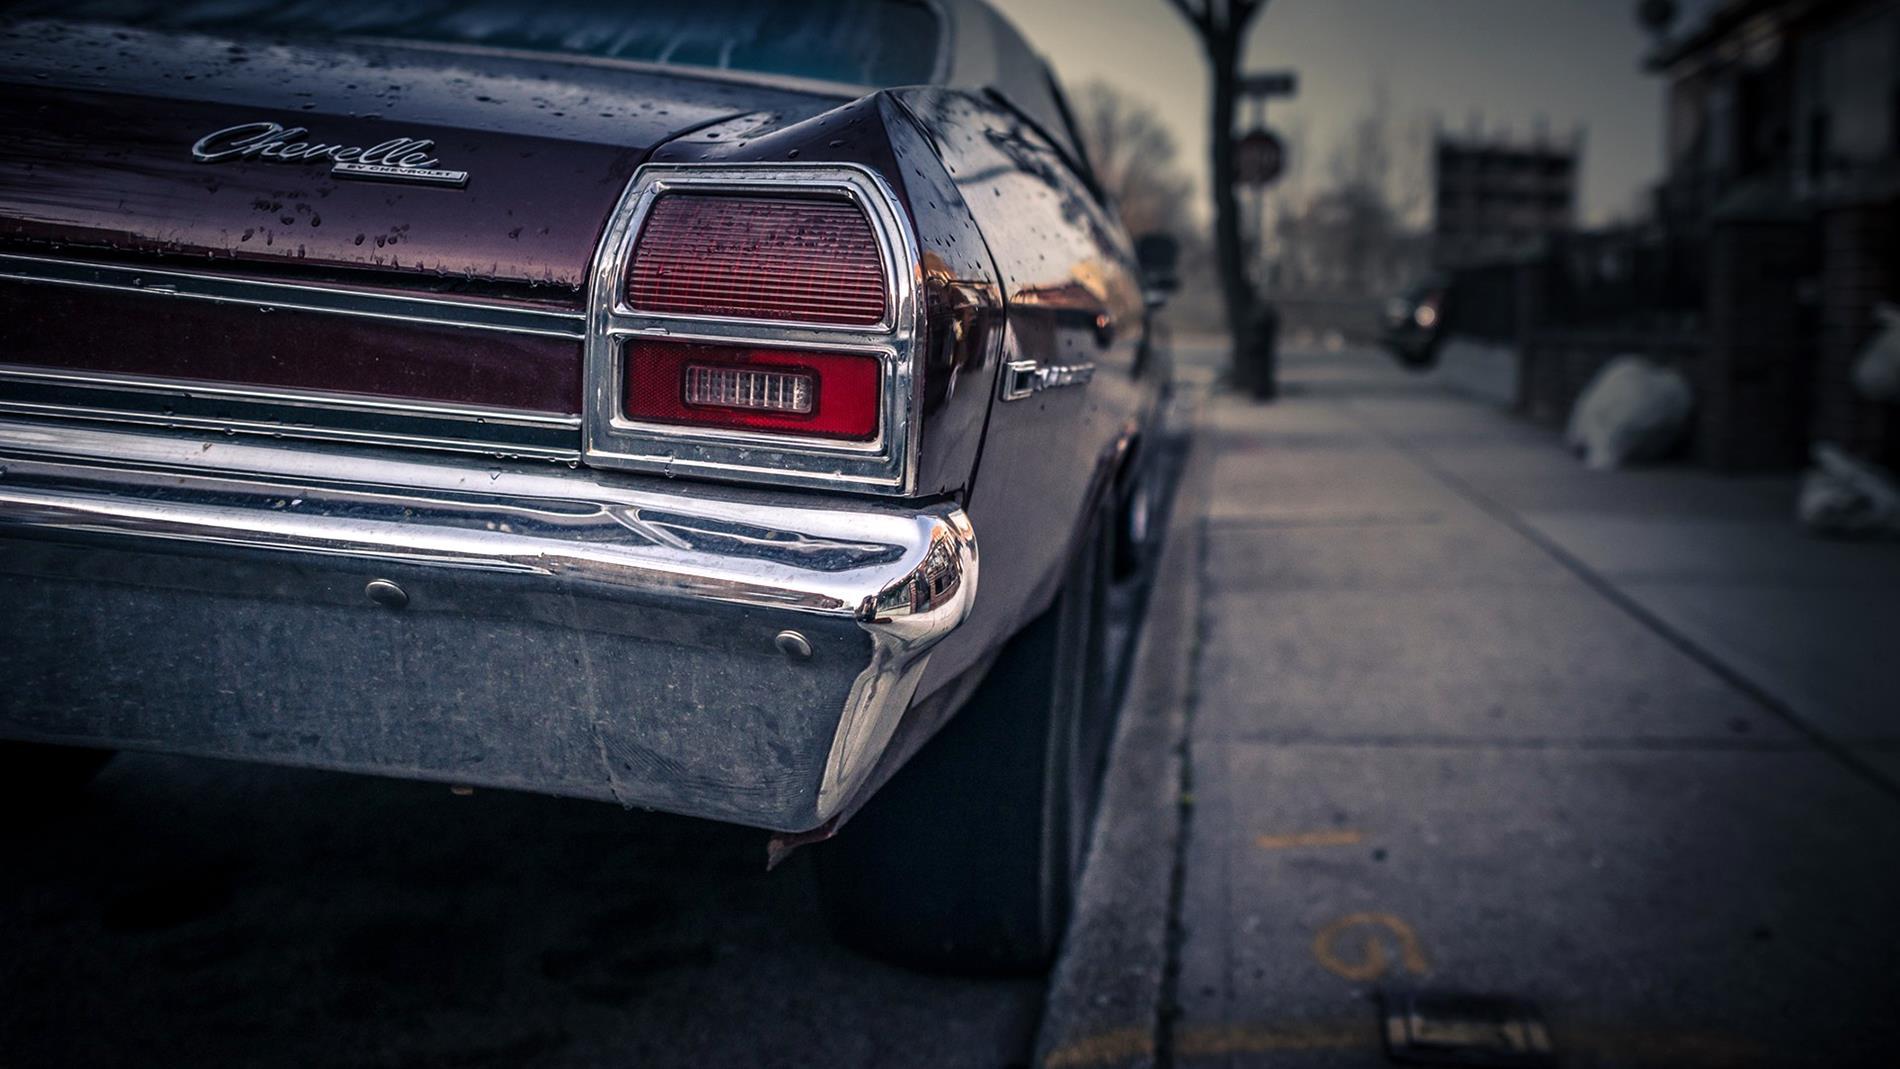 The-Best-Vintage-Car-Wallpapers-26-Best Vintage Car-wv-aston martin-ferarri